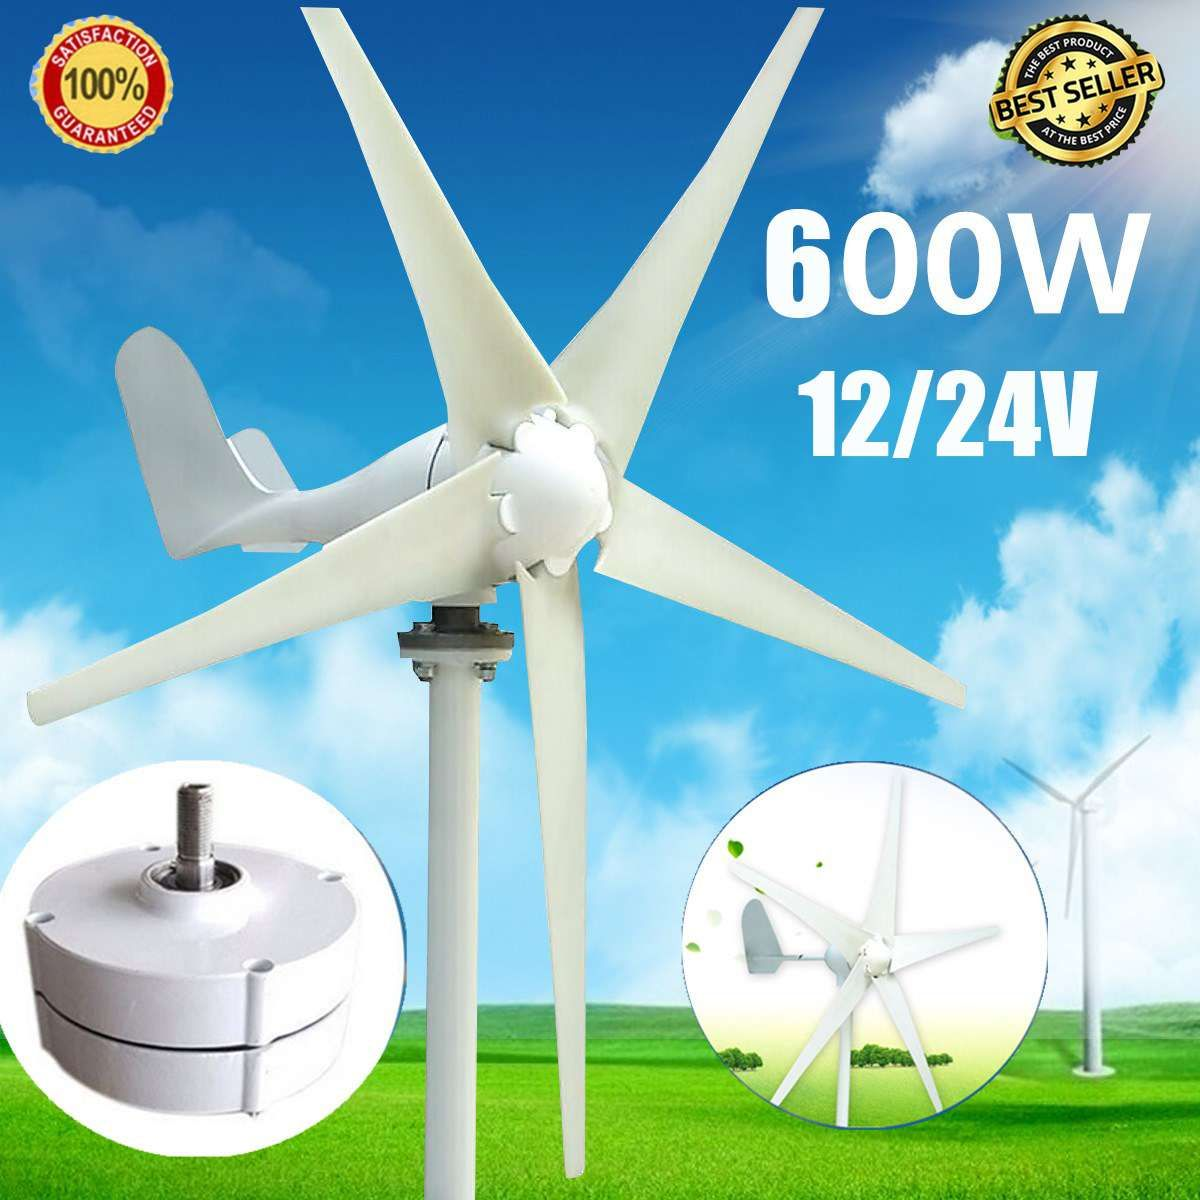 Wind Tur bine Generator Max 600W DC 12V/24V 5 Blade Household Wind Generator 12V/24V 600W Permanent Magnet Generator Tu rbine